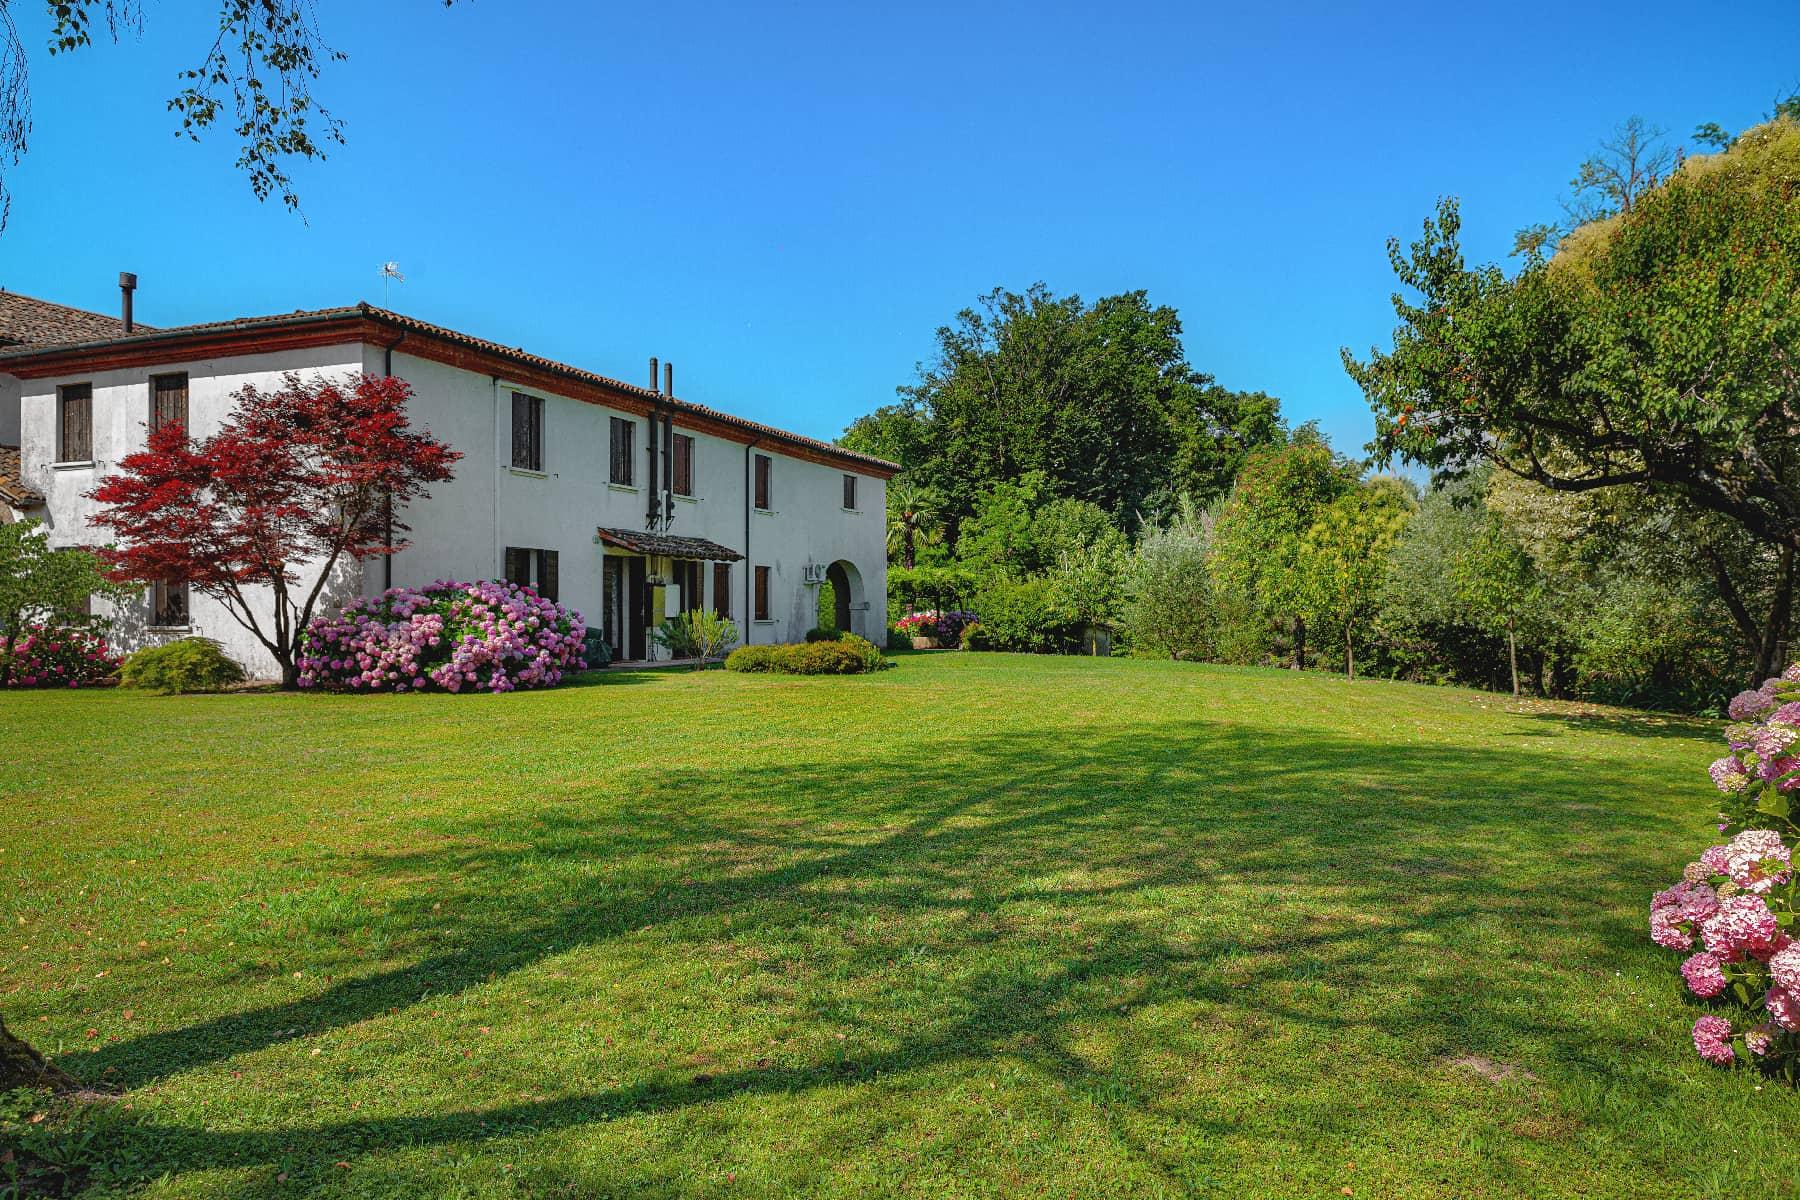 Villa in Vendita a Carbonera: 5 locali, 850 mq - Foto 15